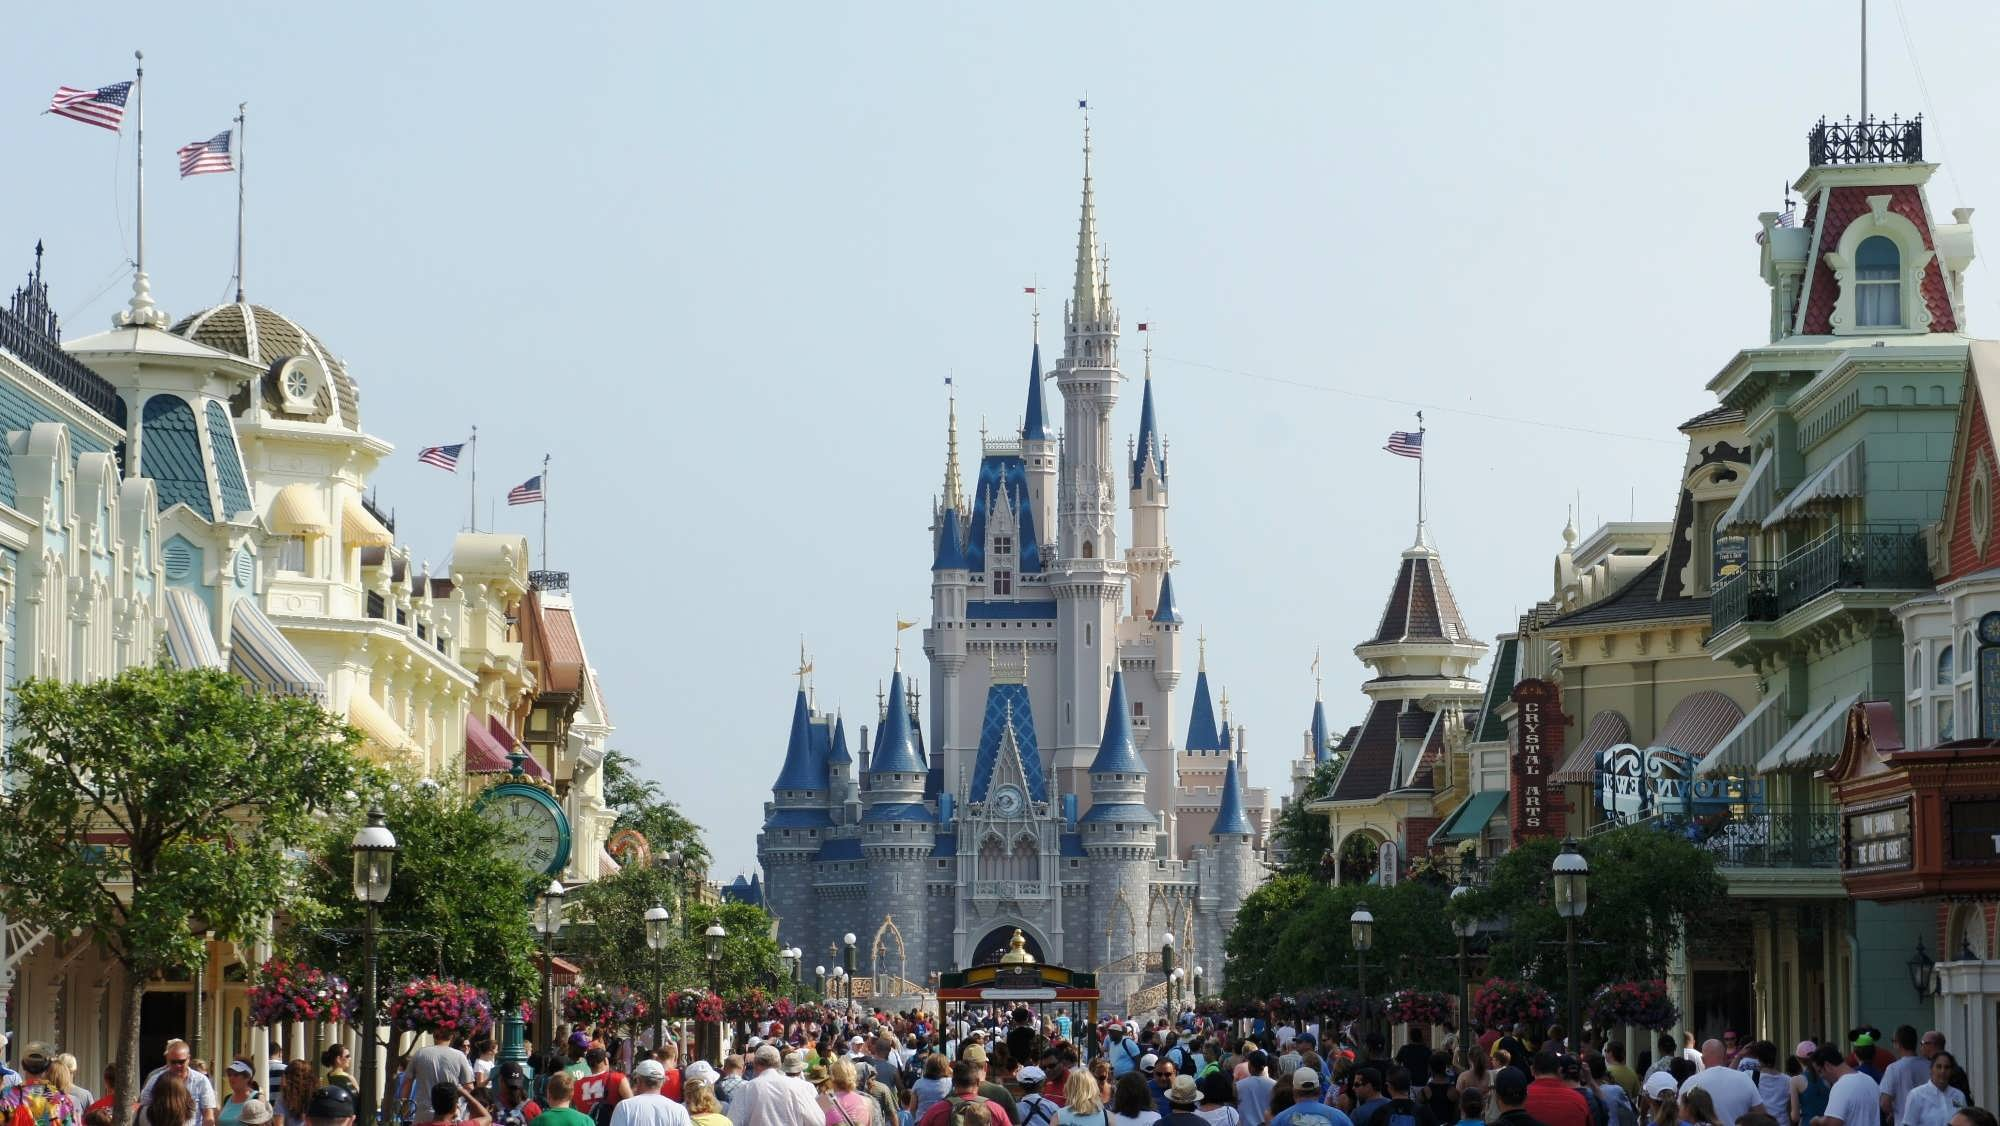 Insider Tips For Visiting All Four Walt Disney World Parks